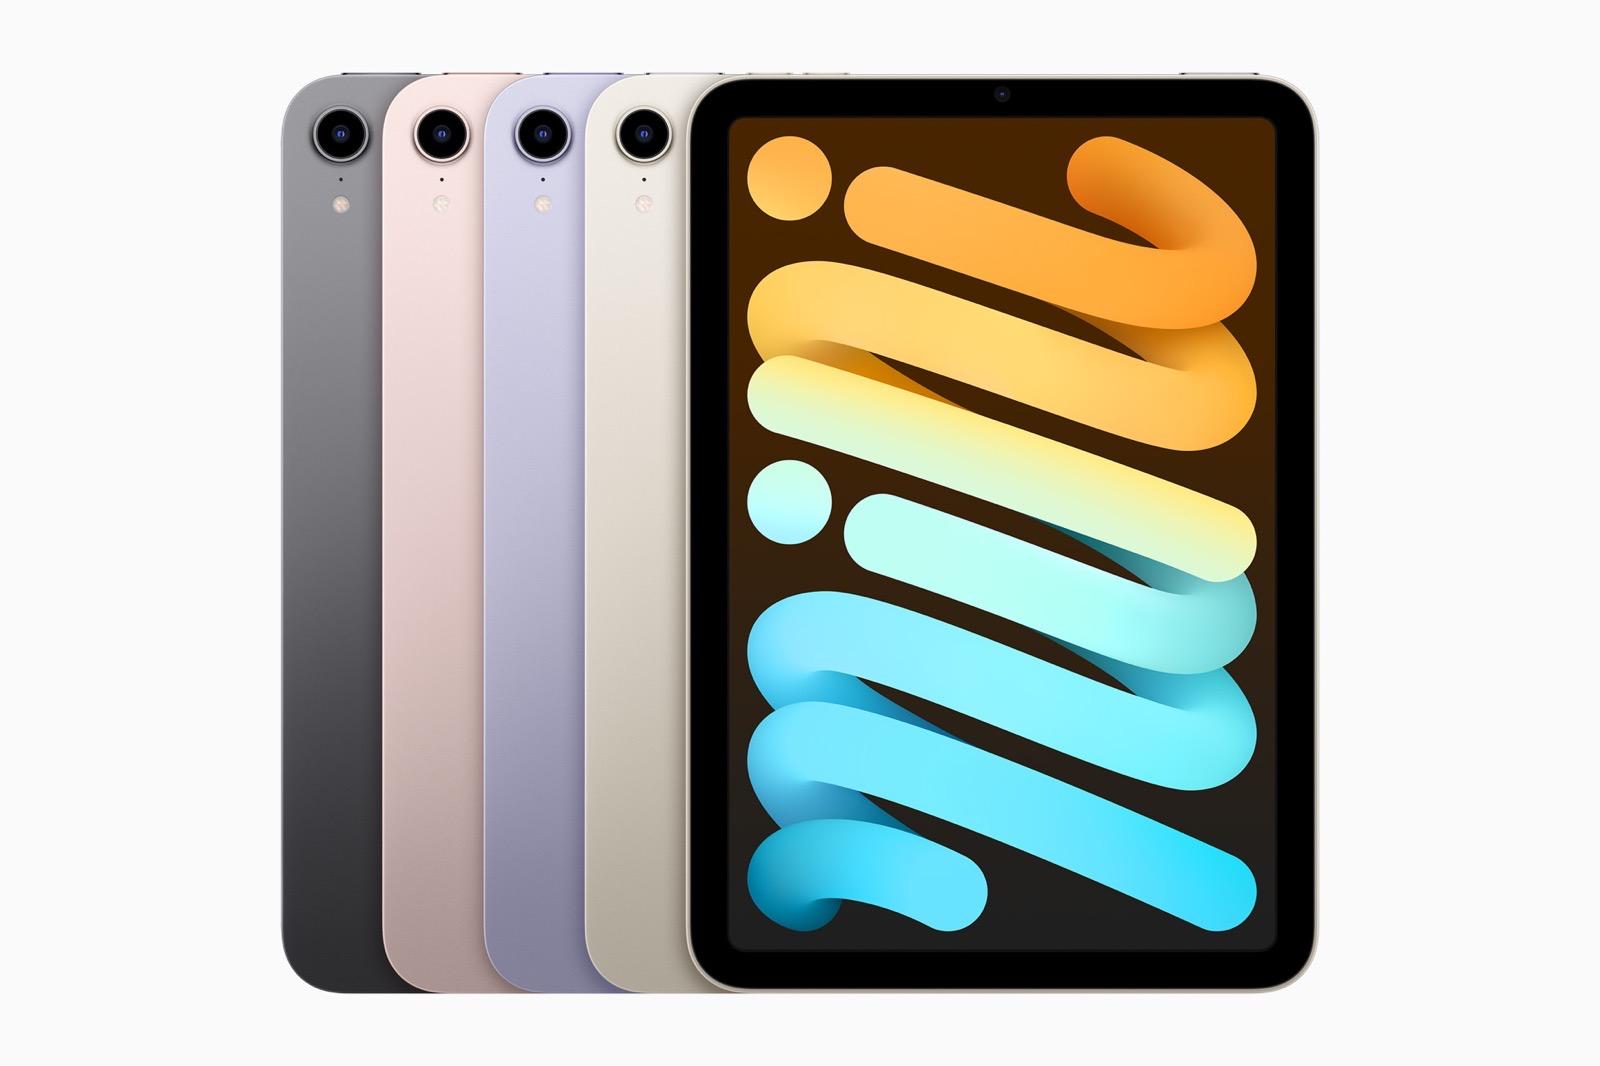 Apple iPad mini colors 09142021